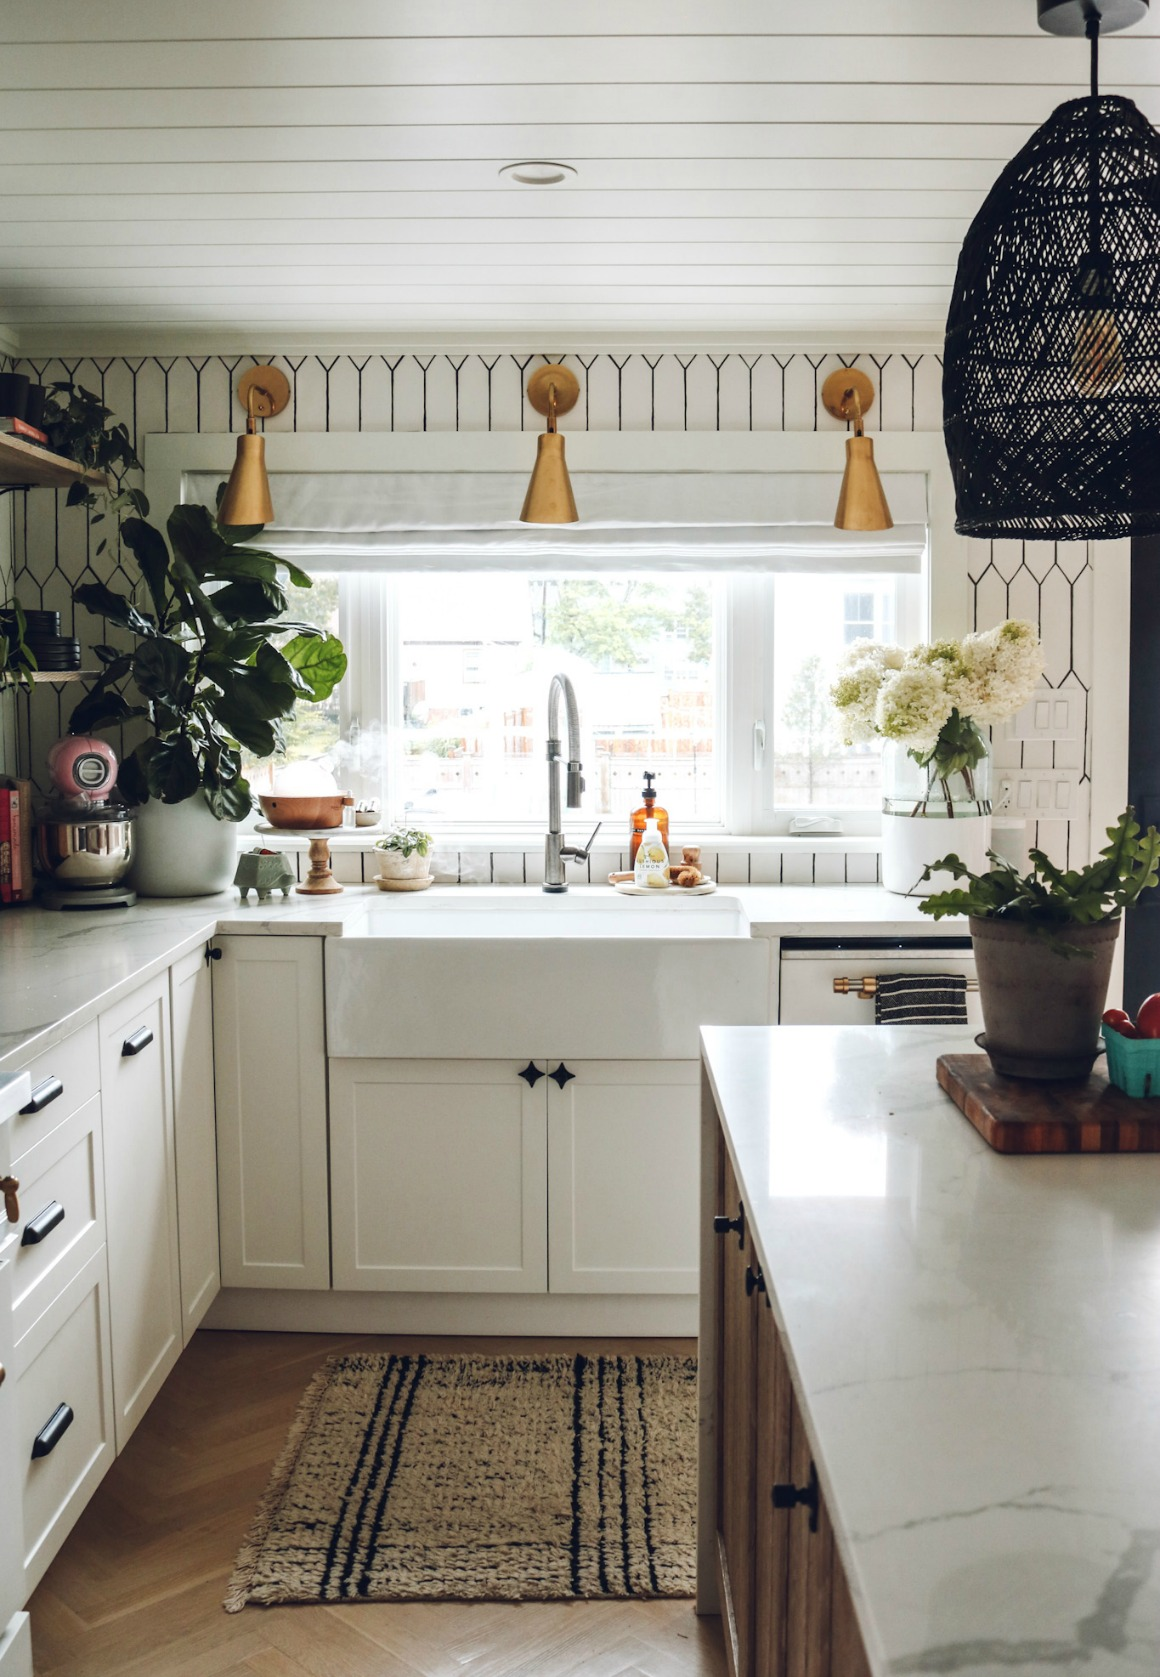 kitchen counters- kitchen decor- kitchen island decor- Kitchen favorites-2